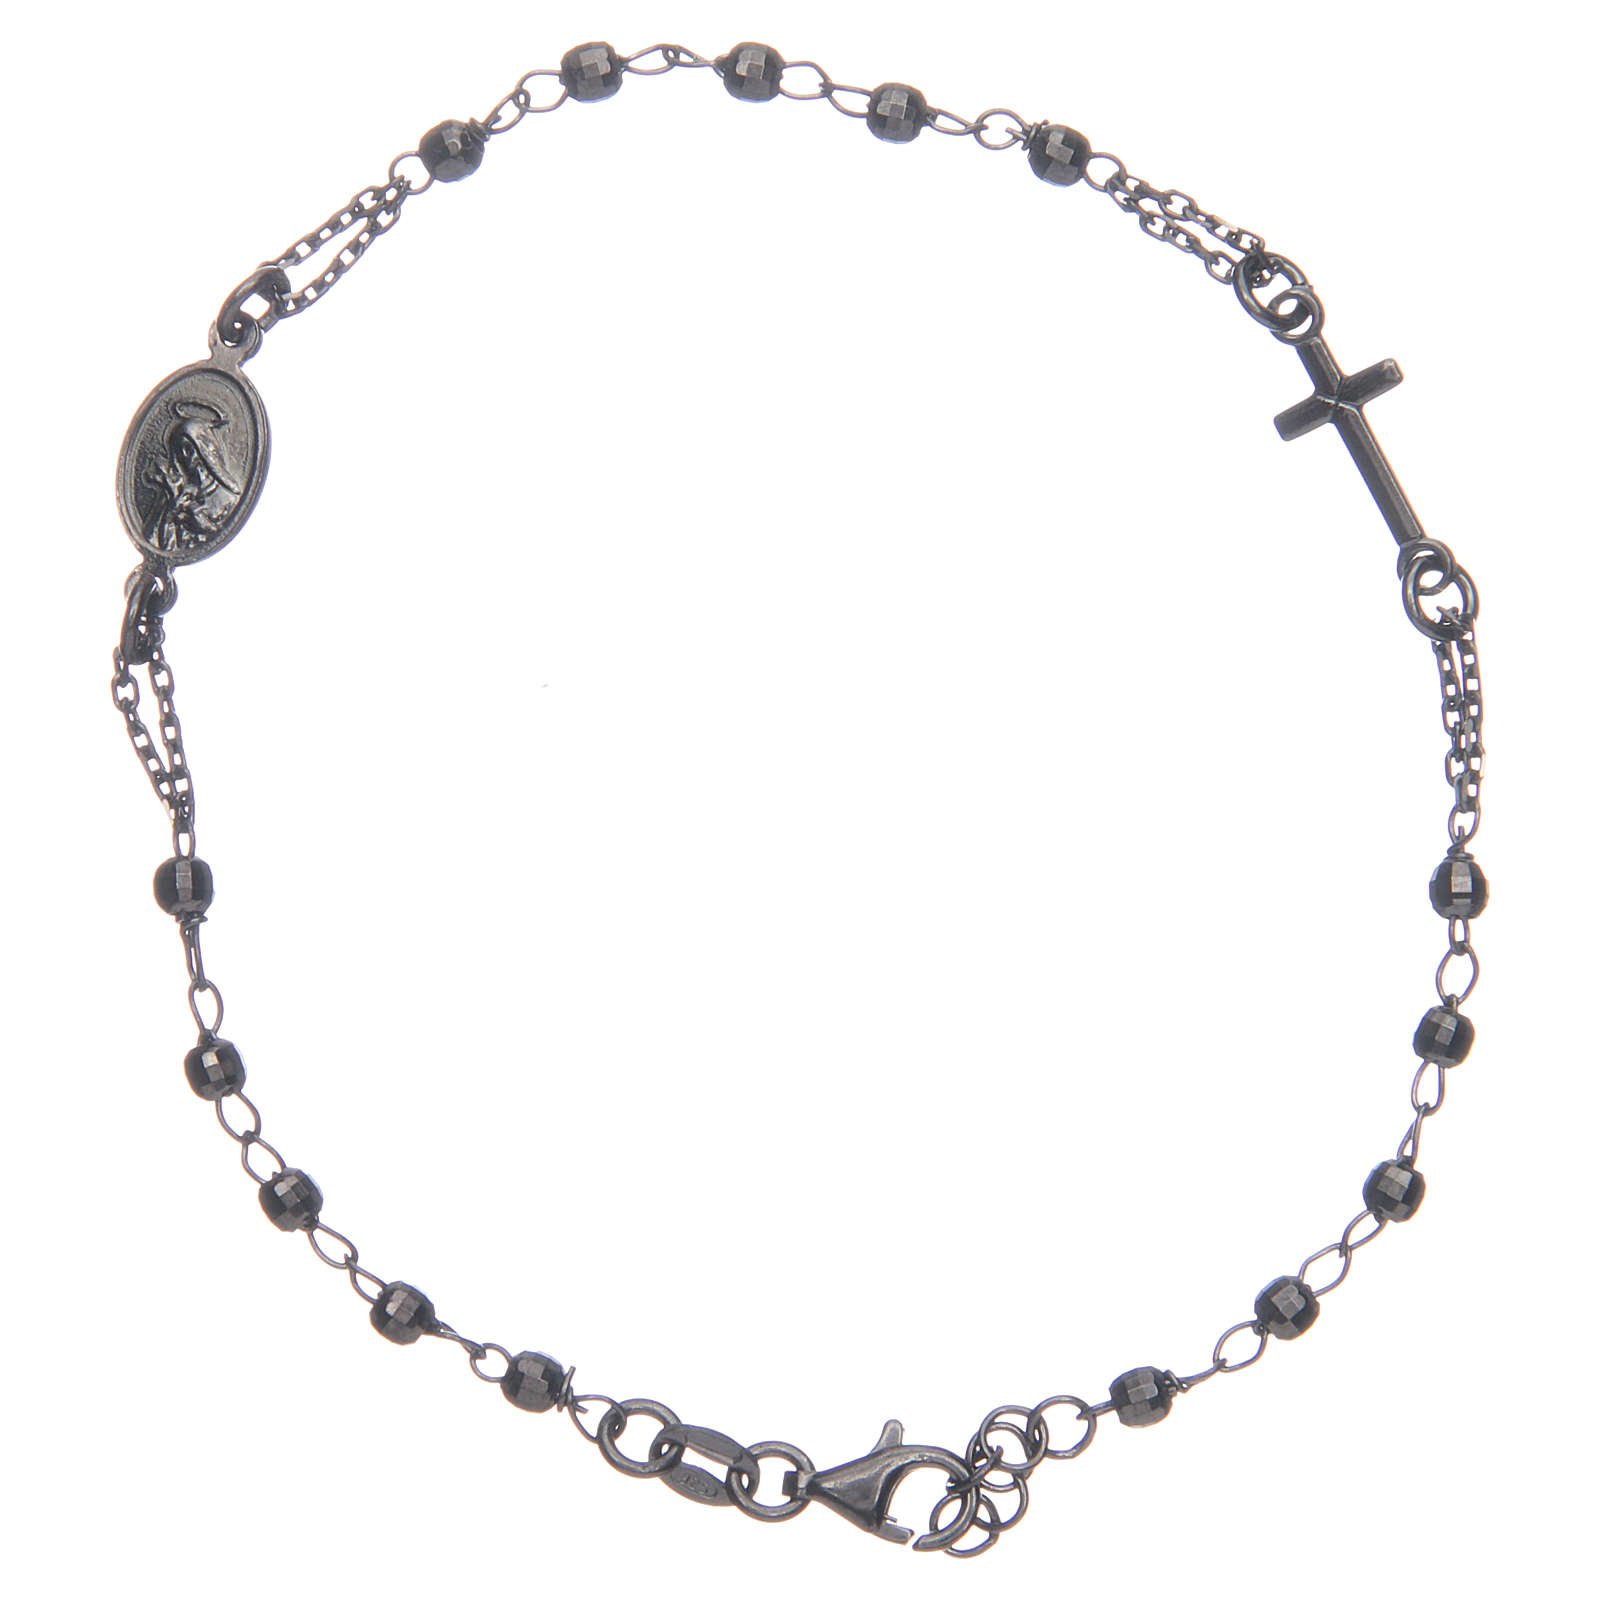 Rosary bracelet Santa Zita smoky grey and black 925 sterling silver 4